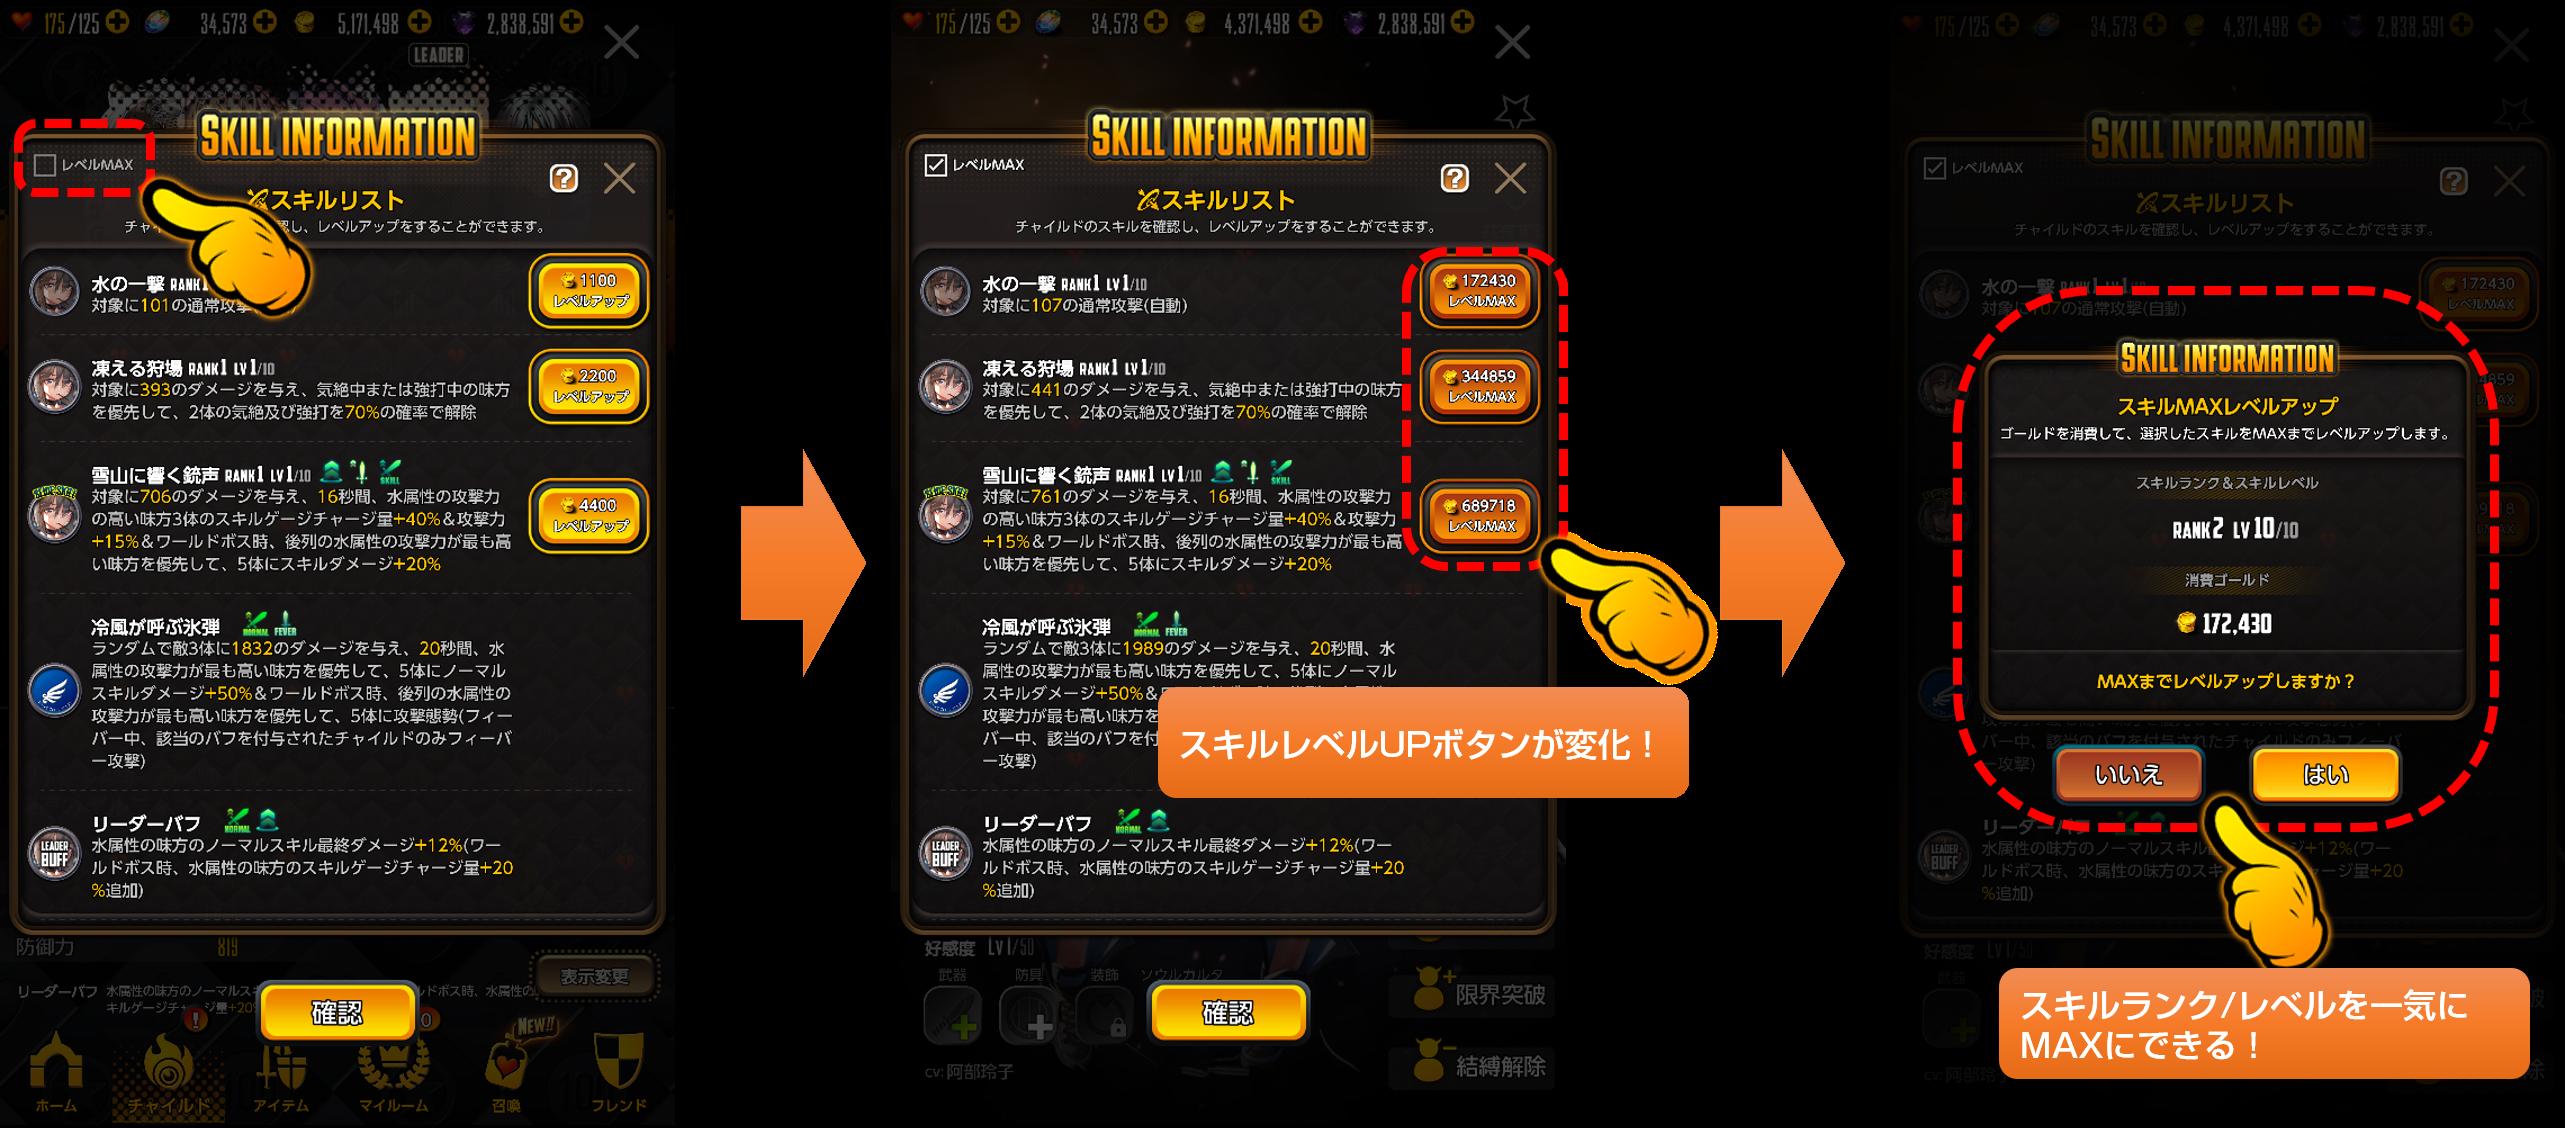 SkillMAX